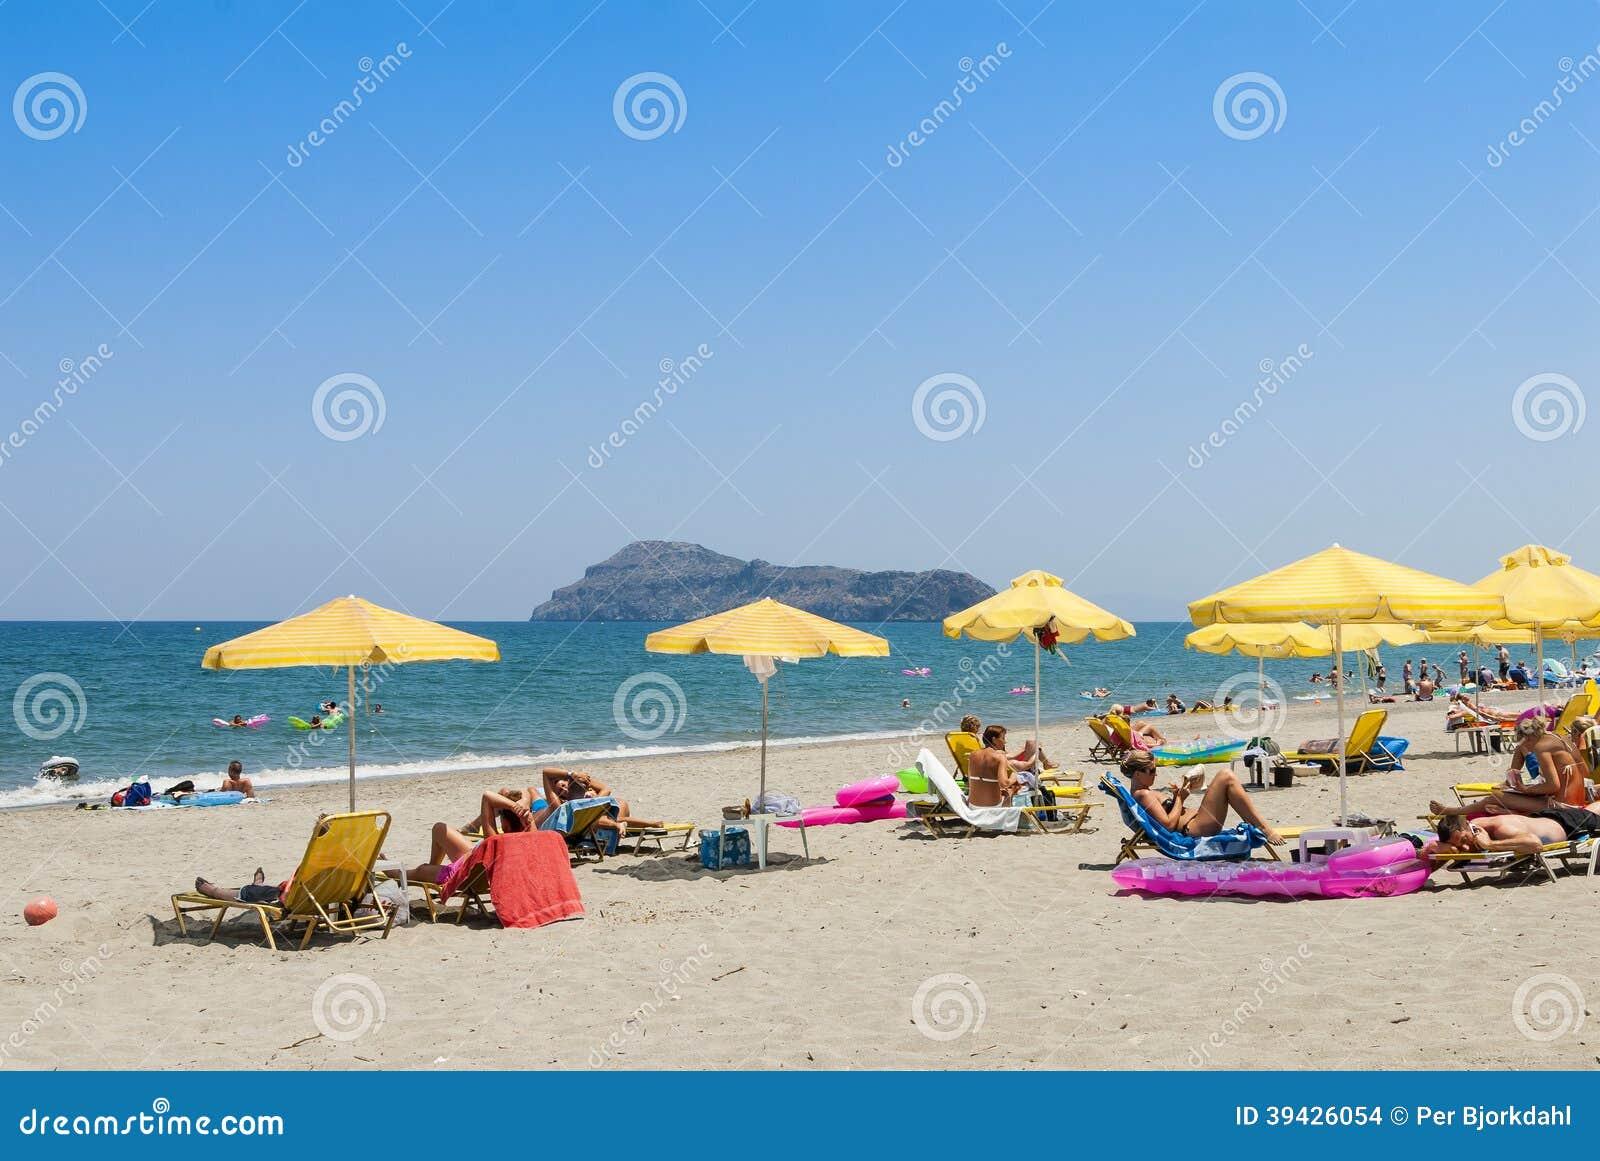 Plataniasstrand met zon parasols en sunloungers